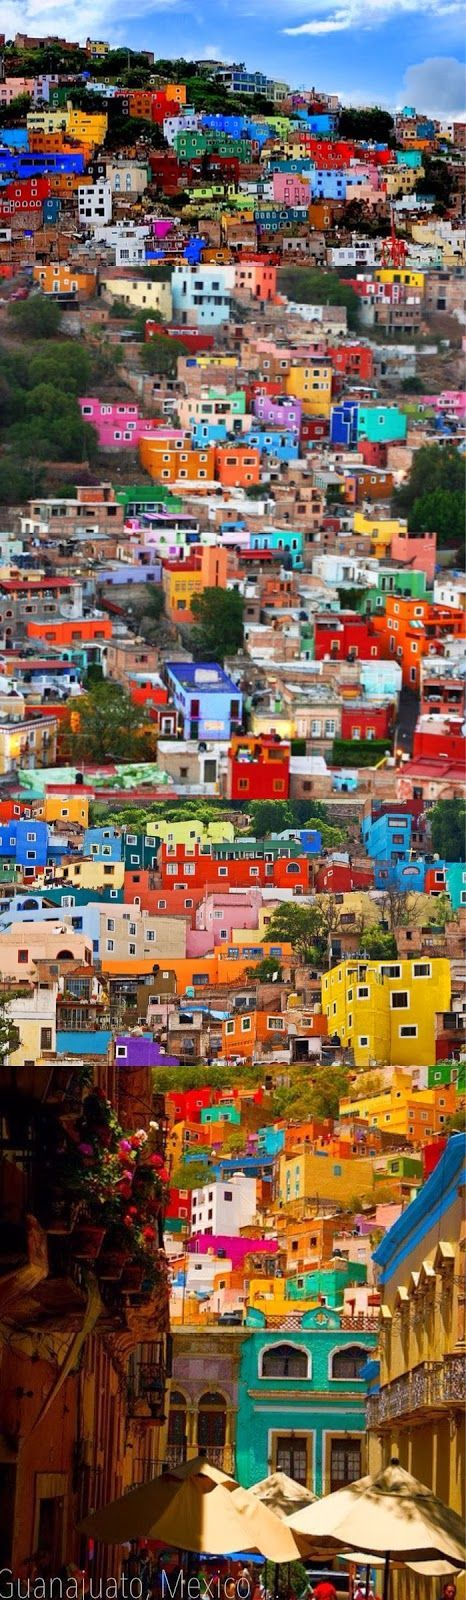 The sprawl of Guanajuato, Mexico. Visit with Octopoda.co.uk